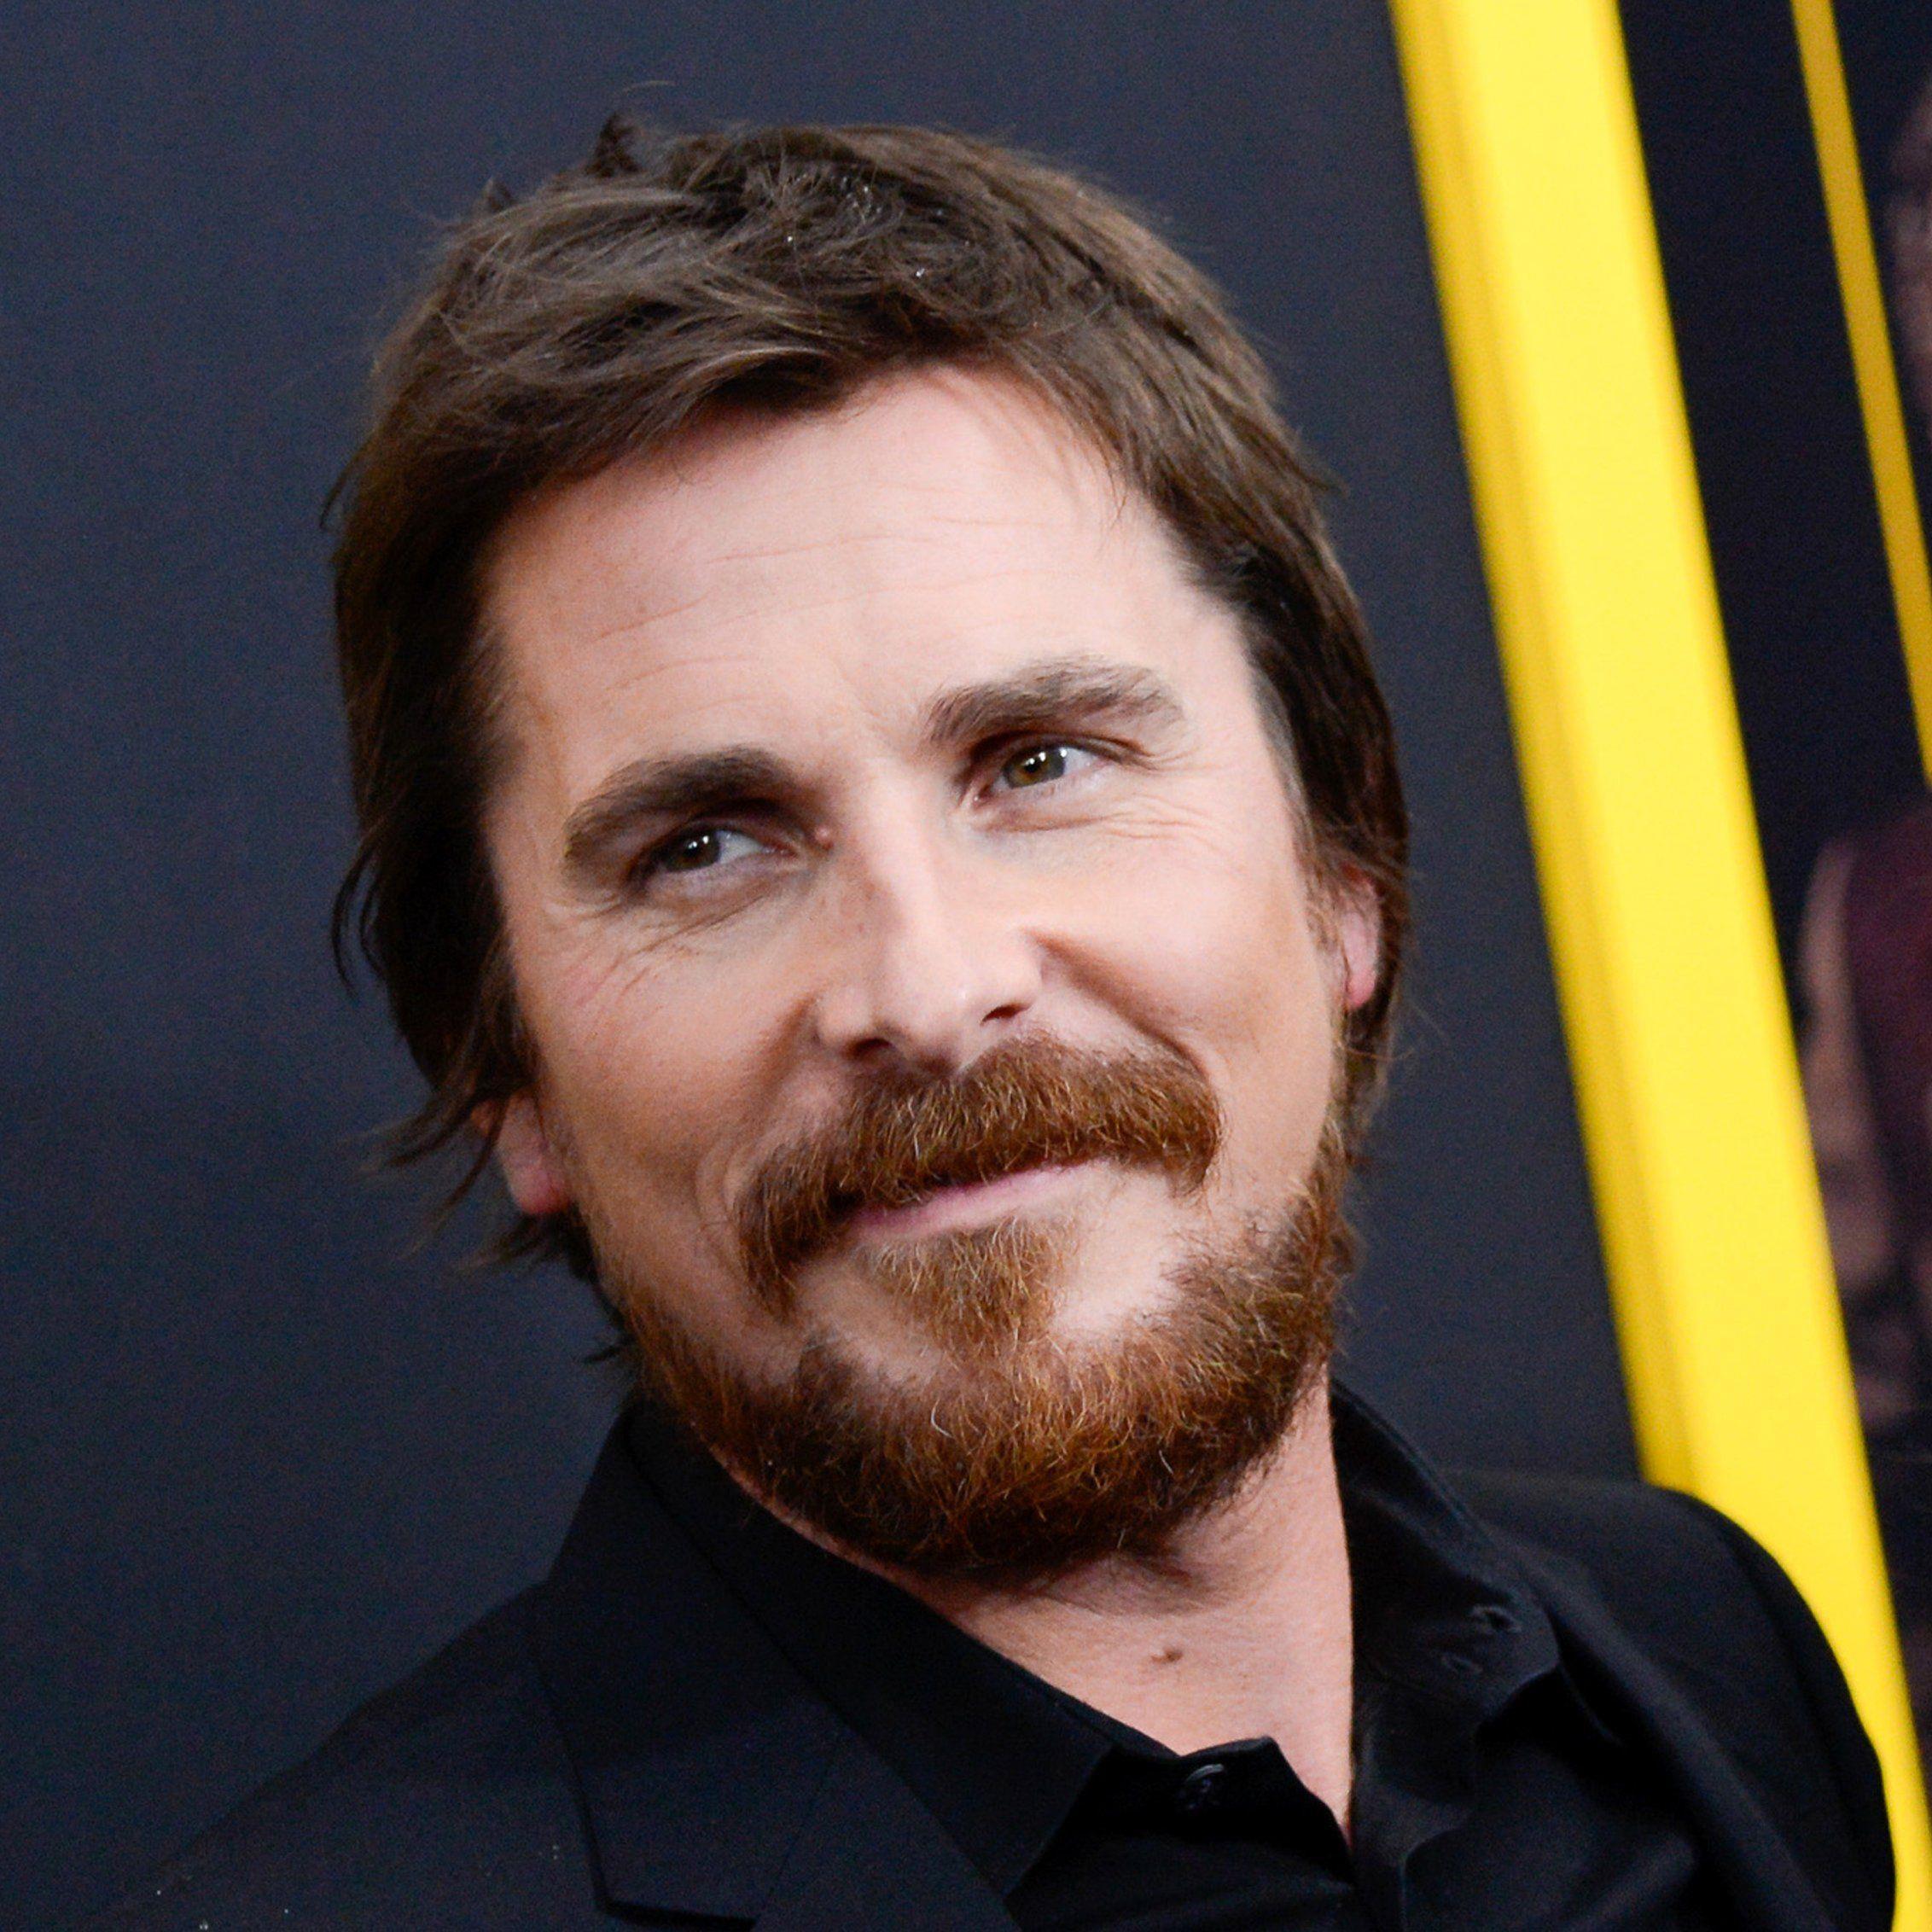 Christian Bale hat es sich nun doch anders überlegt.